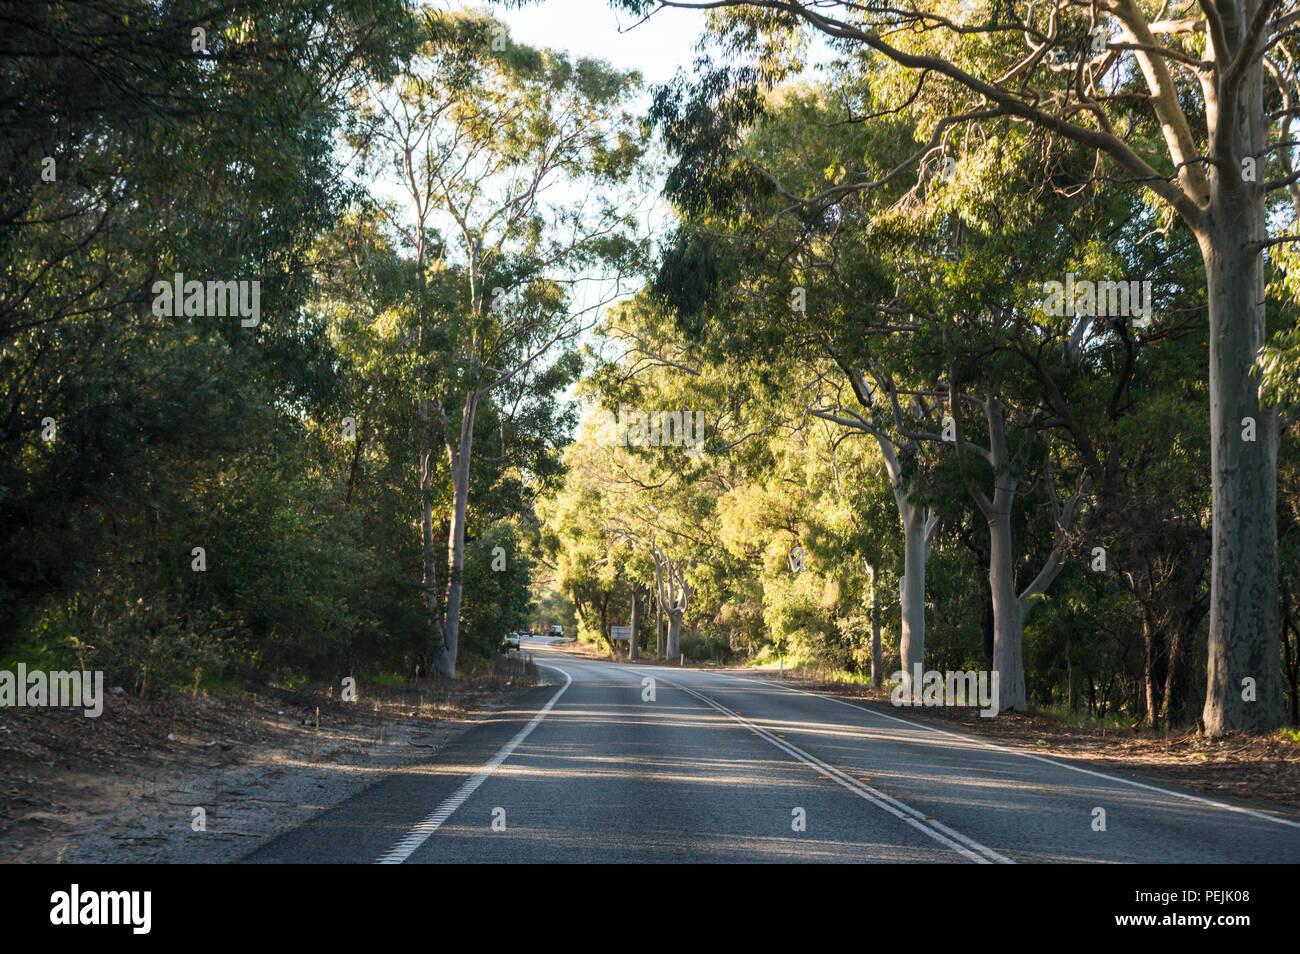 Perth Road Stock Photos & Perth Road Stock Images - Alamy